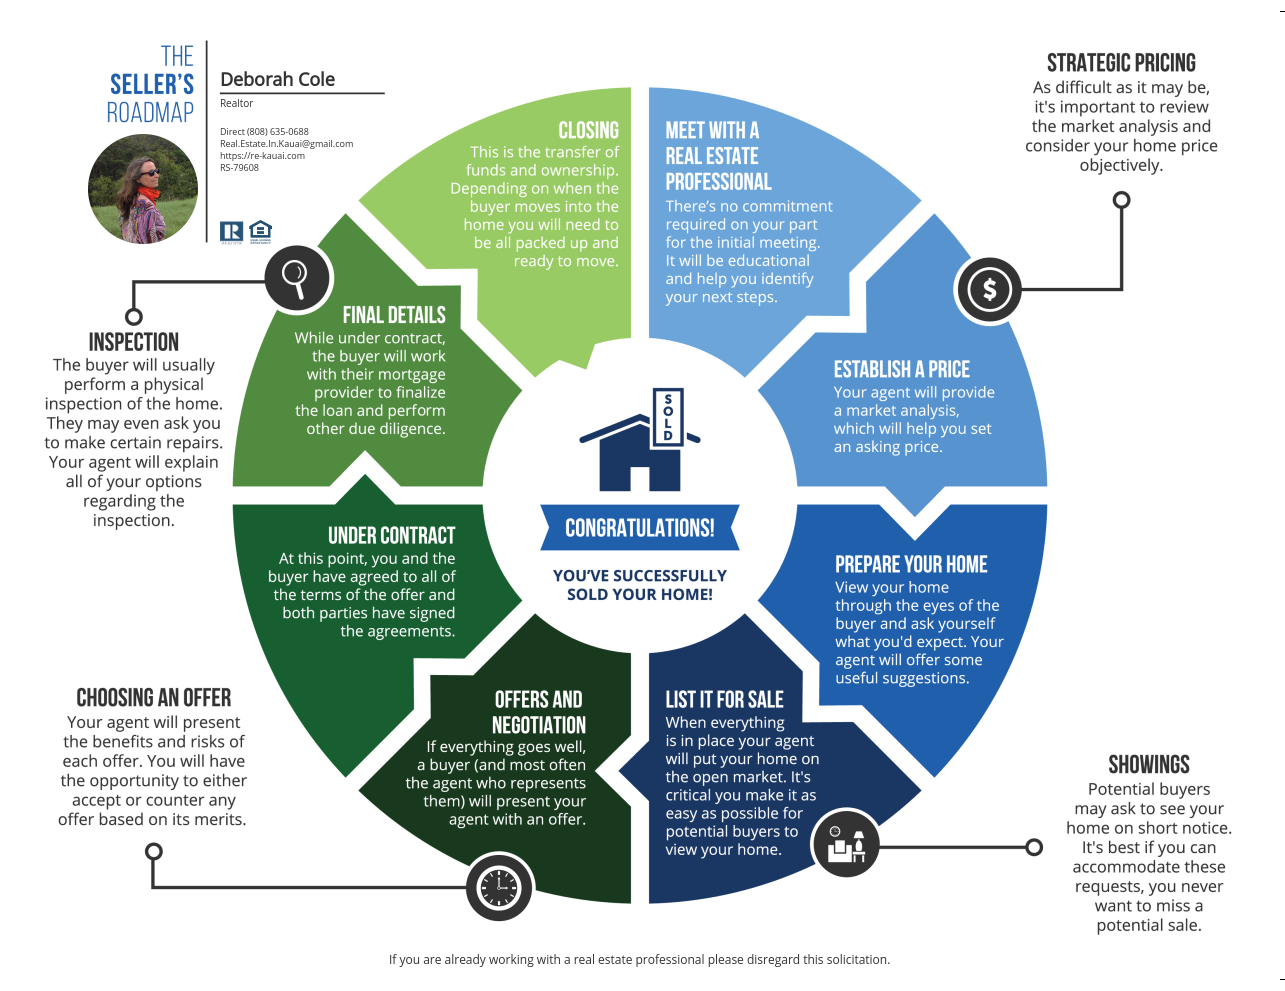 Seller's Roadmap to Success